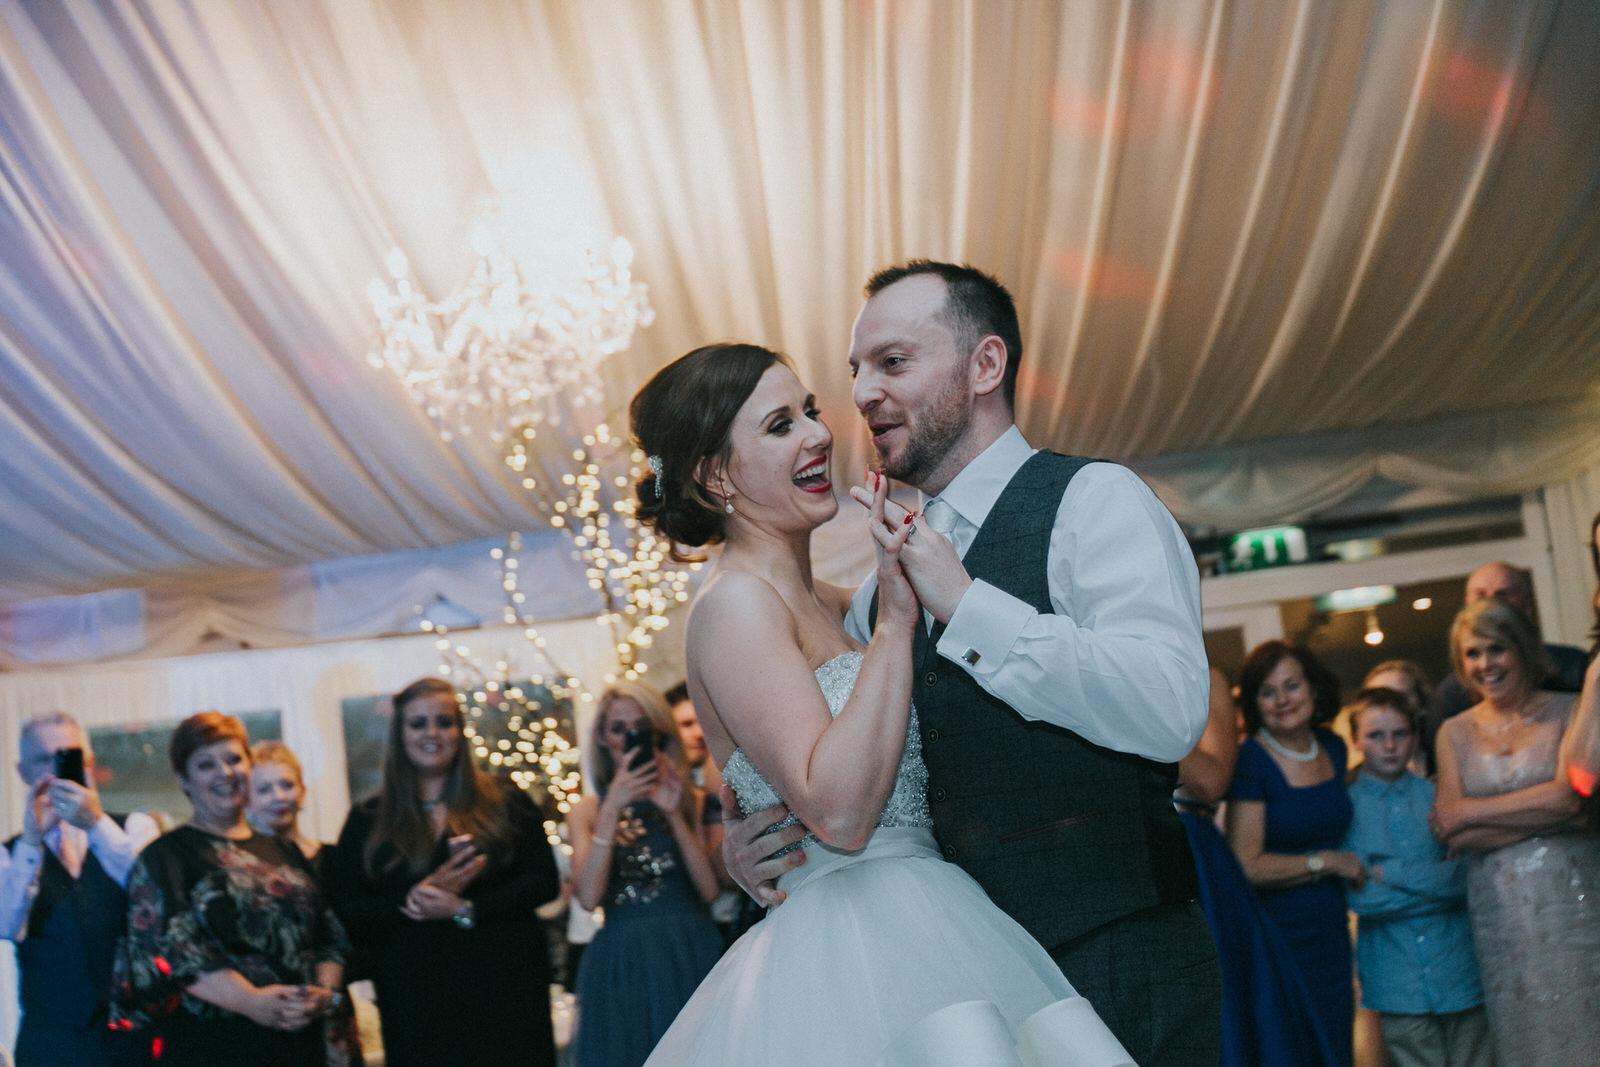 Clonabreany_wedding-photographer_roger_kenny_ireland_122.jpg